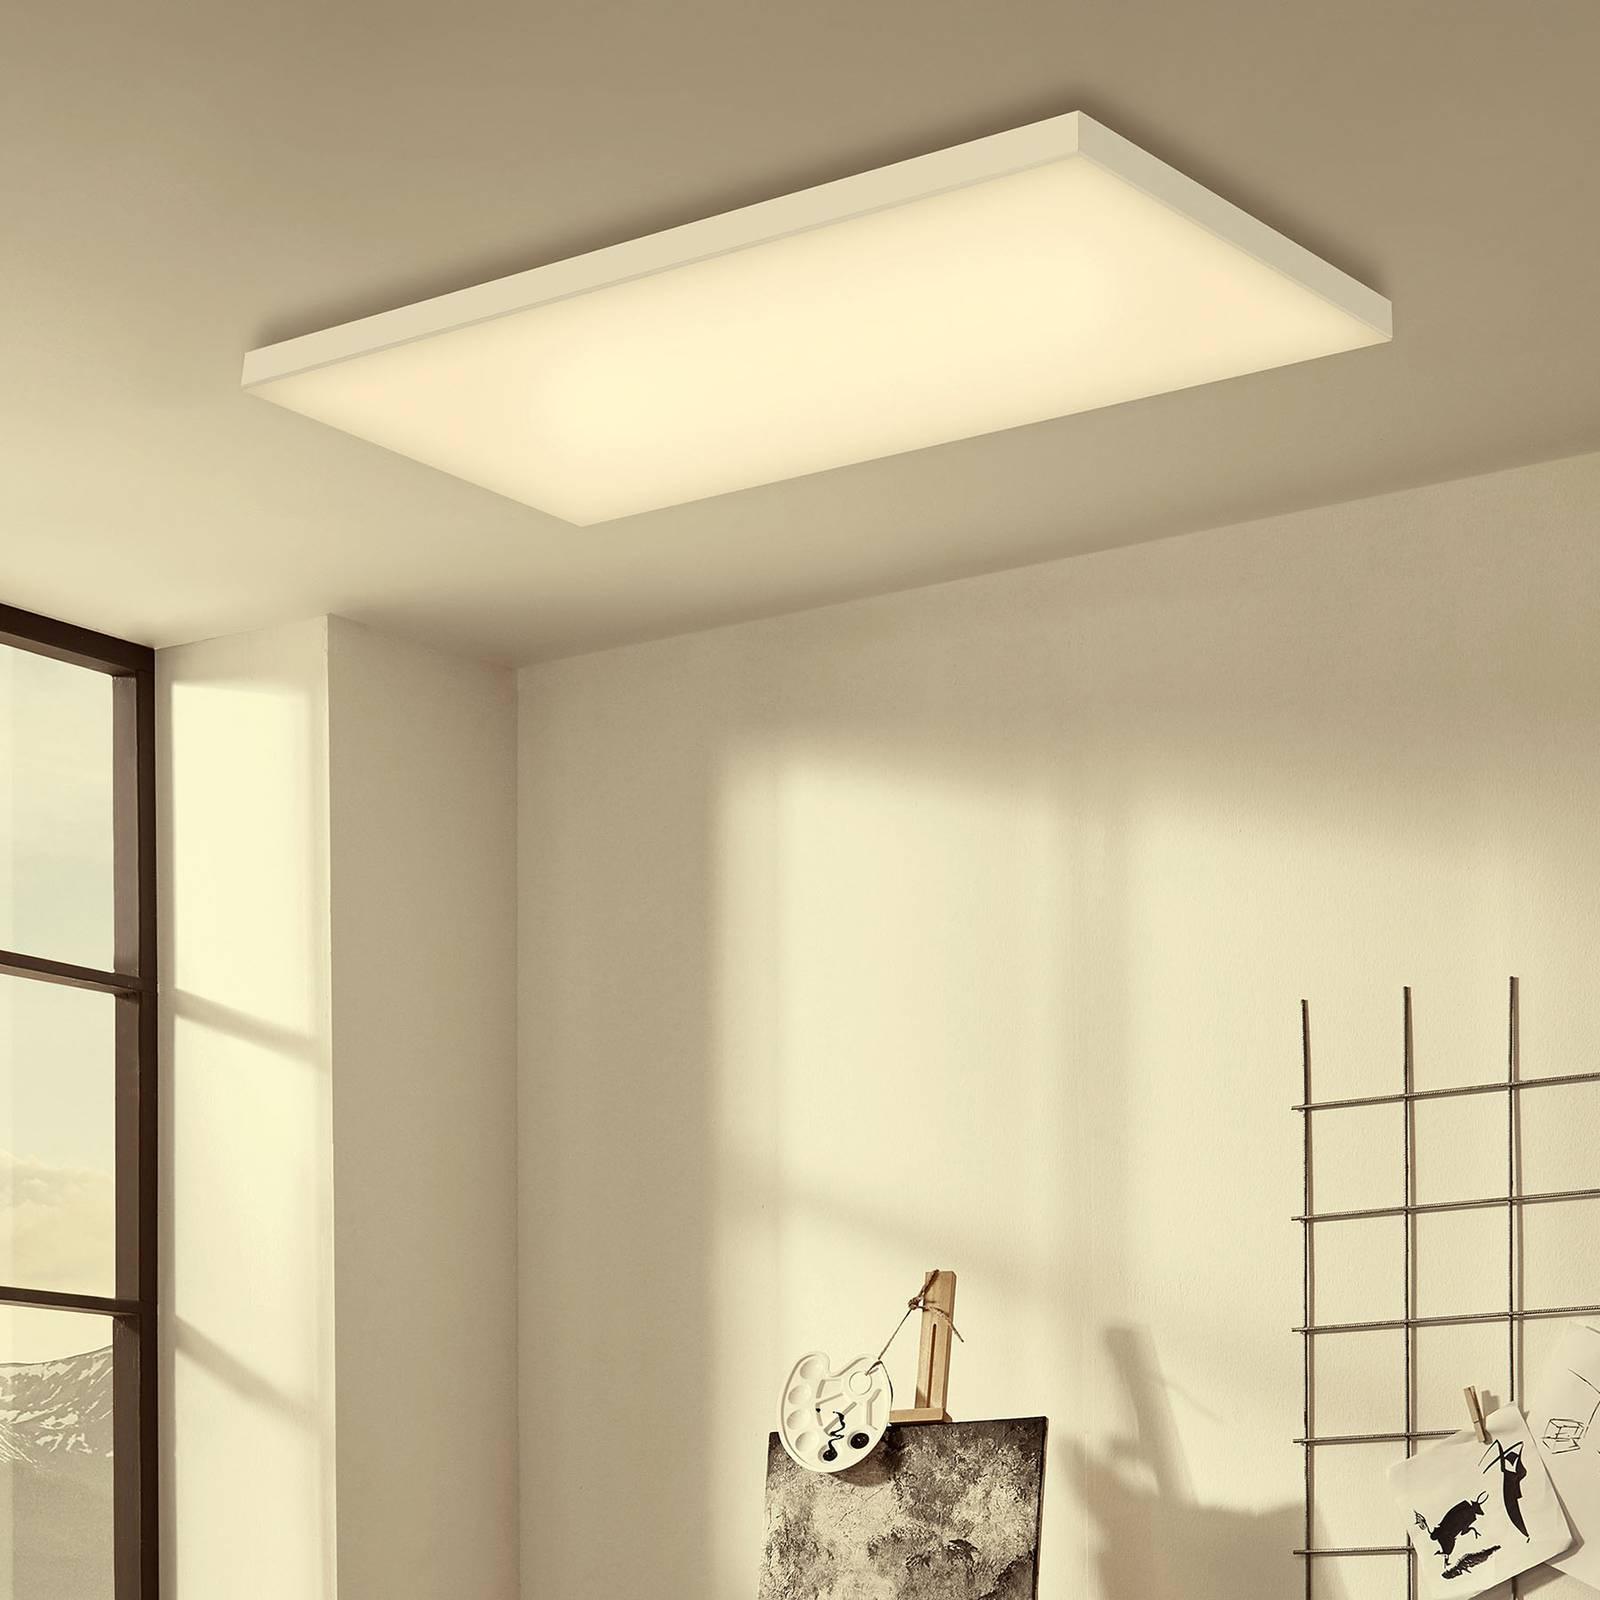 LED plafondlamp Frameless RGBW, 60x30cm